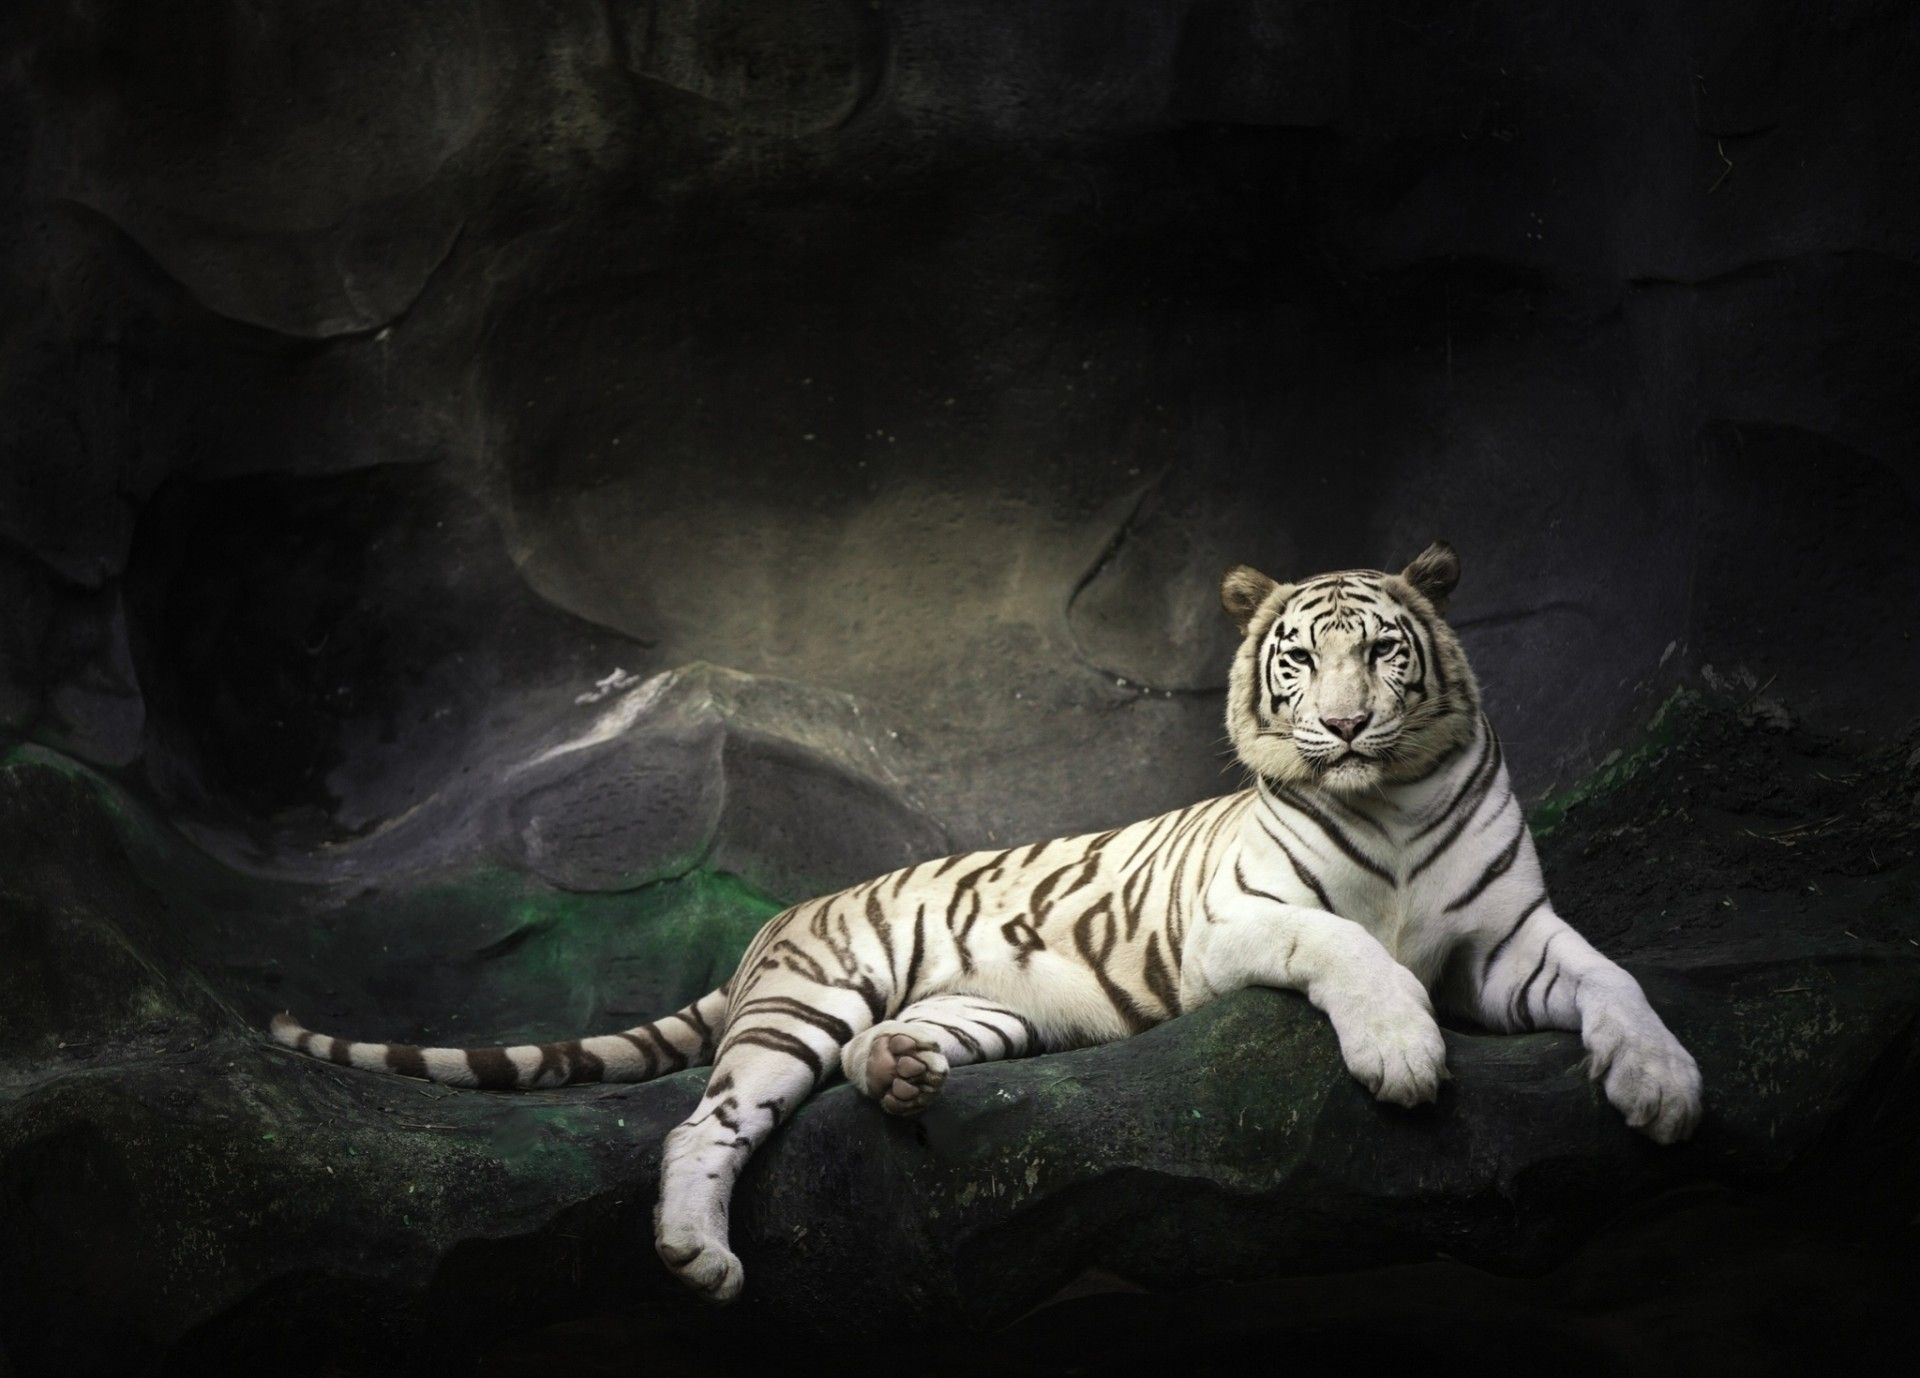 White Tiger resting, New Wallpaper